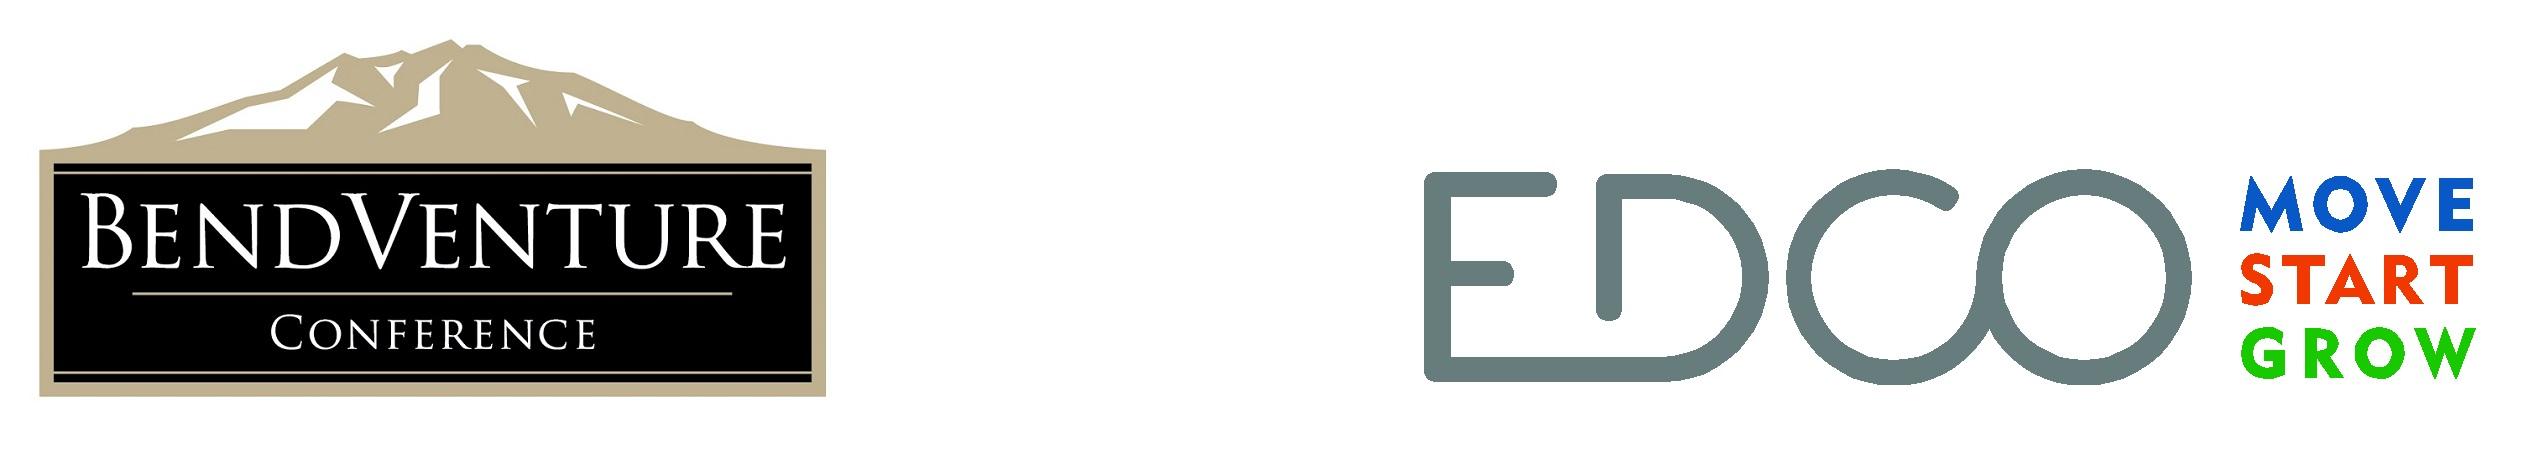 bvc-logo-with-edco-logo